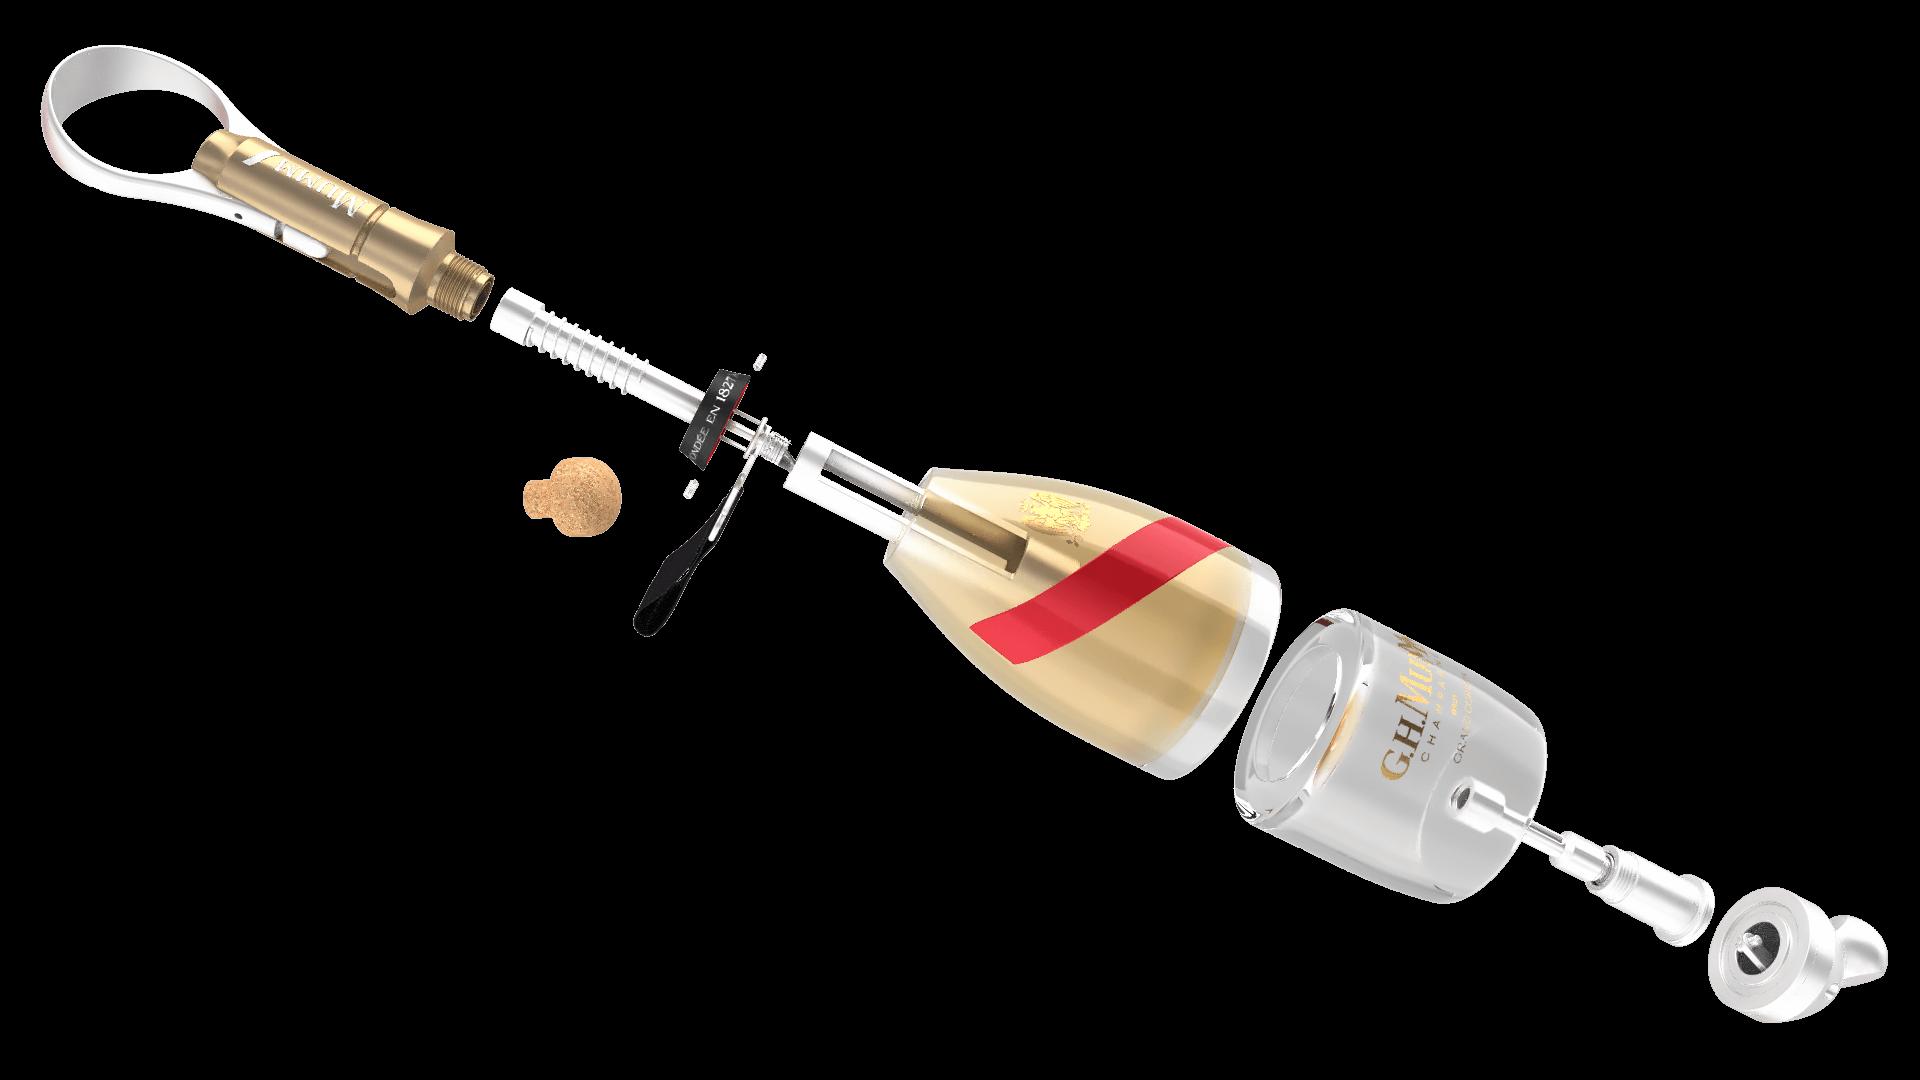 Resultado de imagen para octave de gaulle bottle champagne